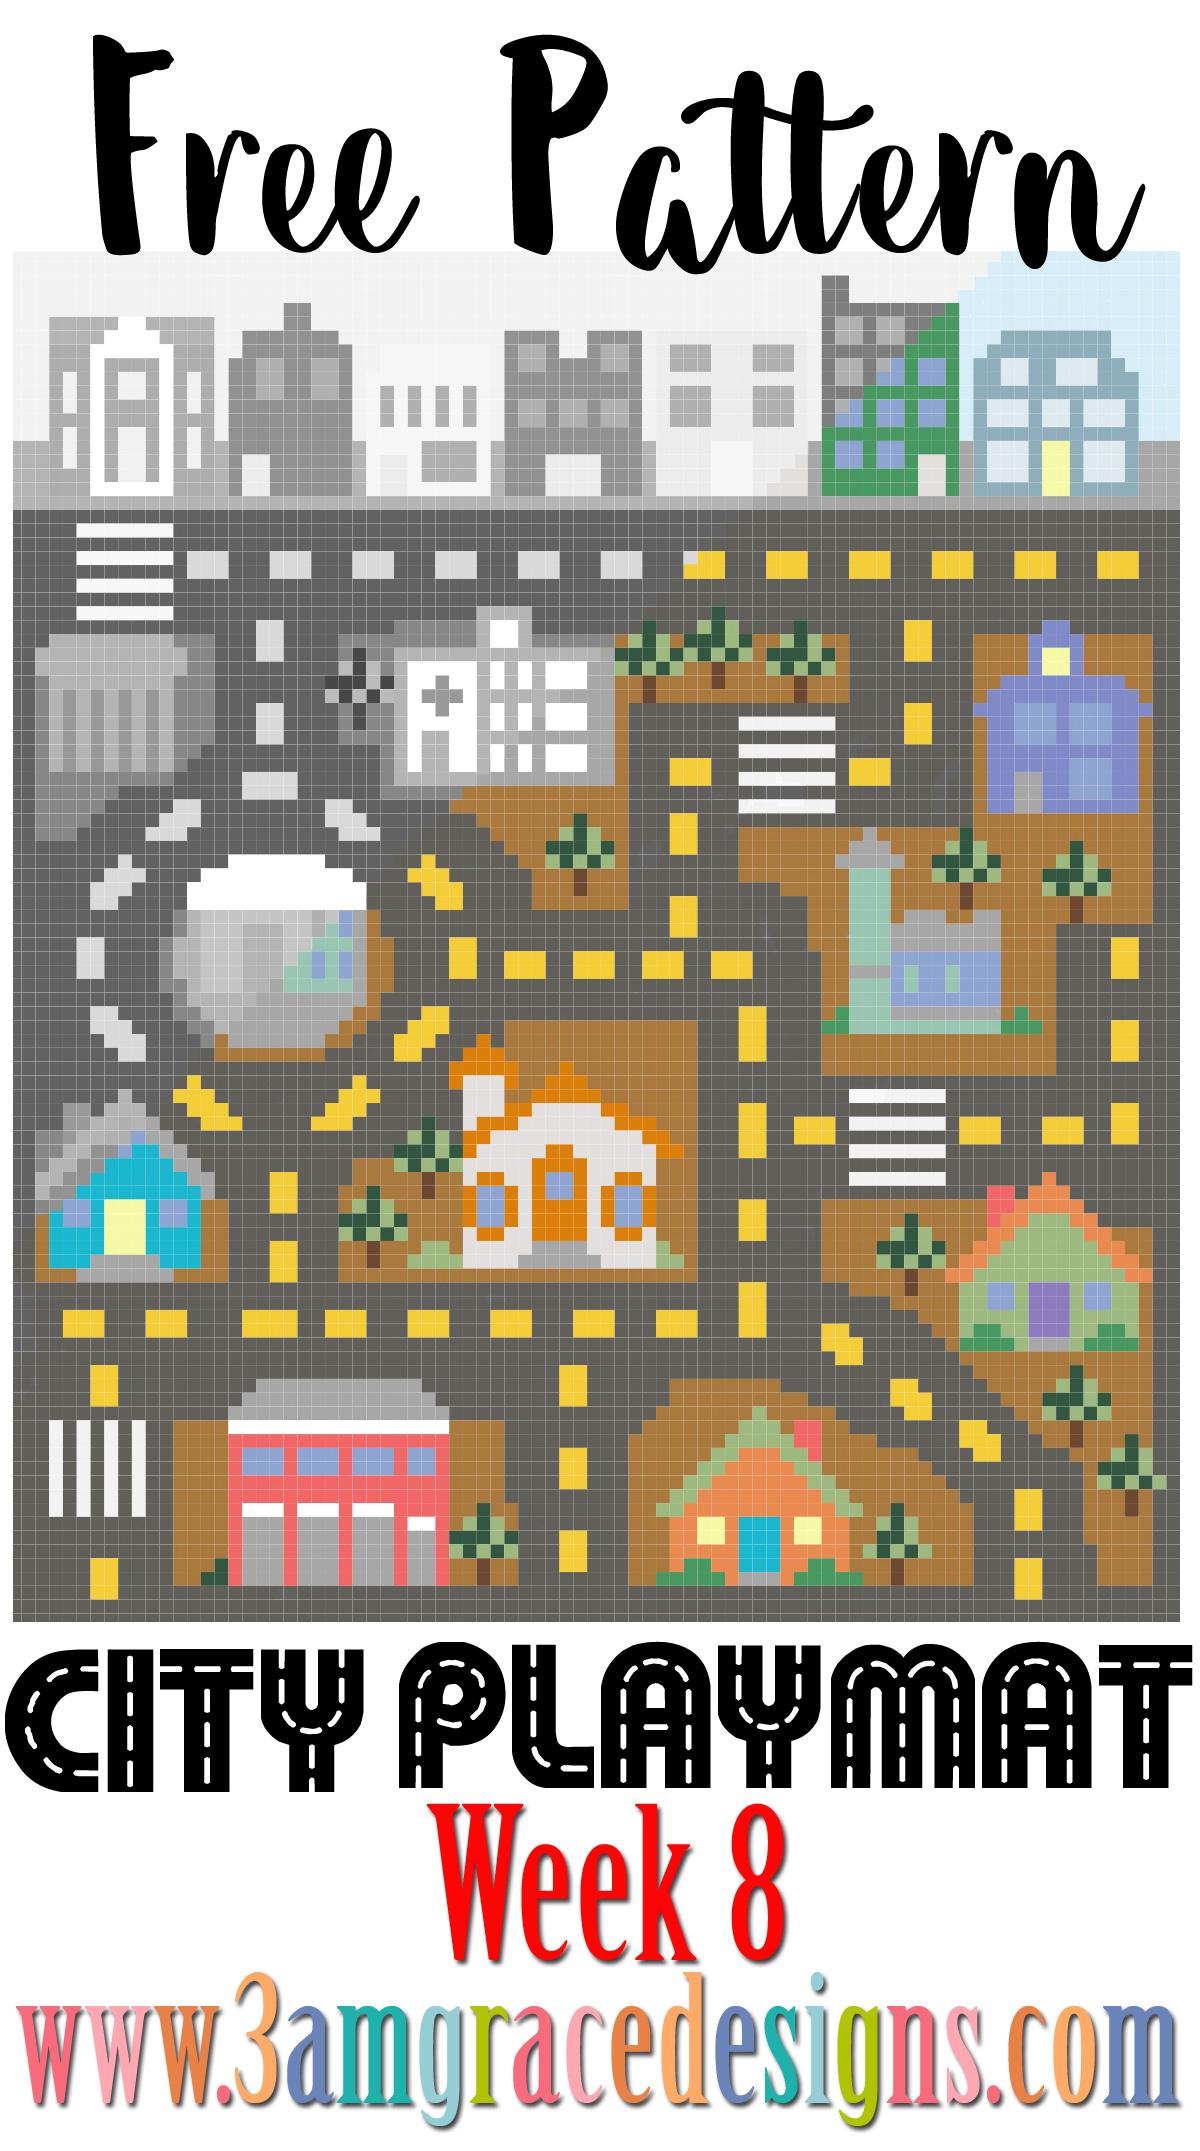 City Play Mat C2c Cal Week 8 Free Crochet Pattern 3amgracedesigns